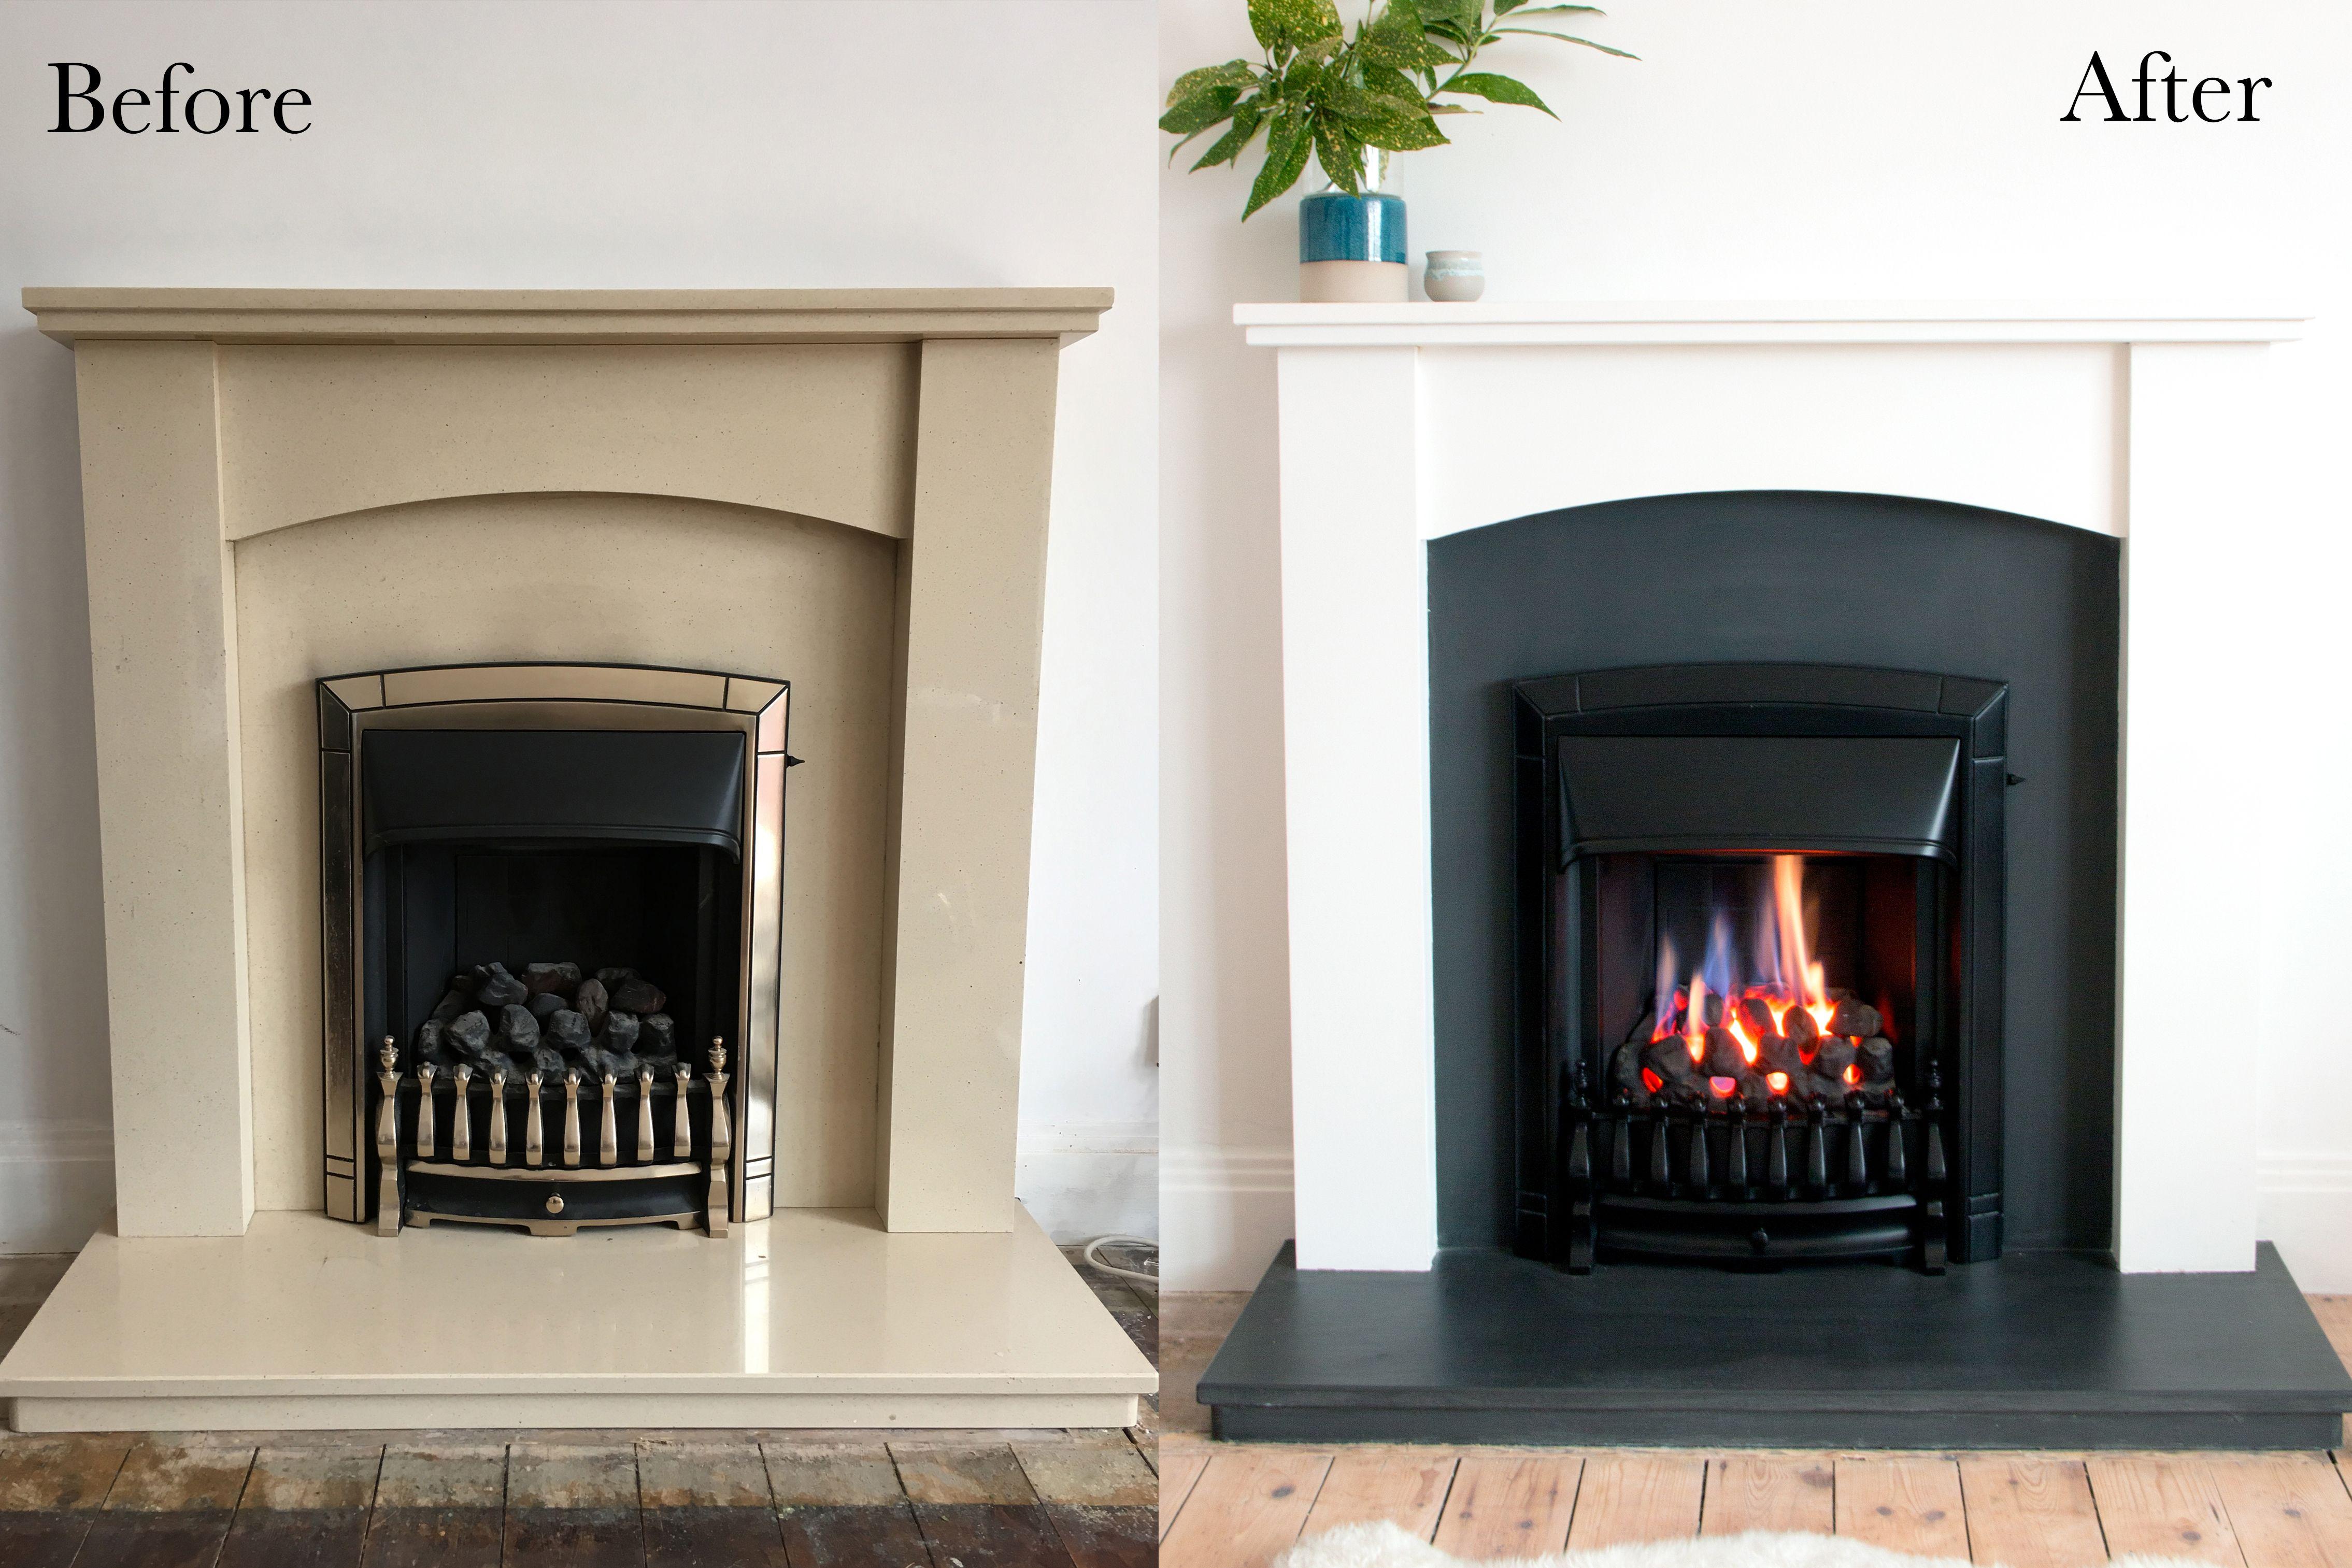 Houseofdibs Co Uk Fireplace Upgrade Diy Under 50